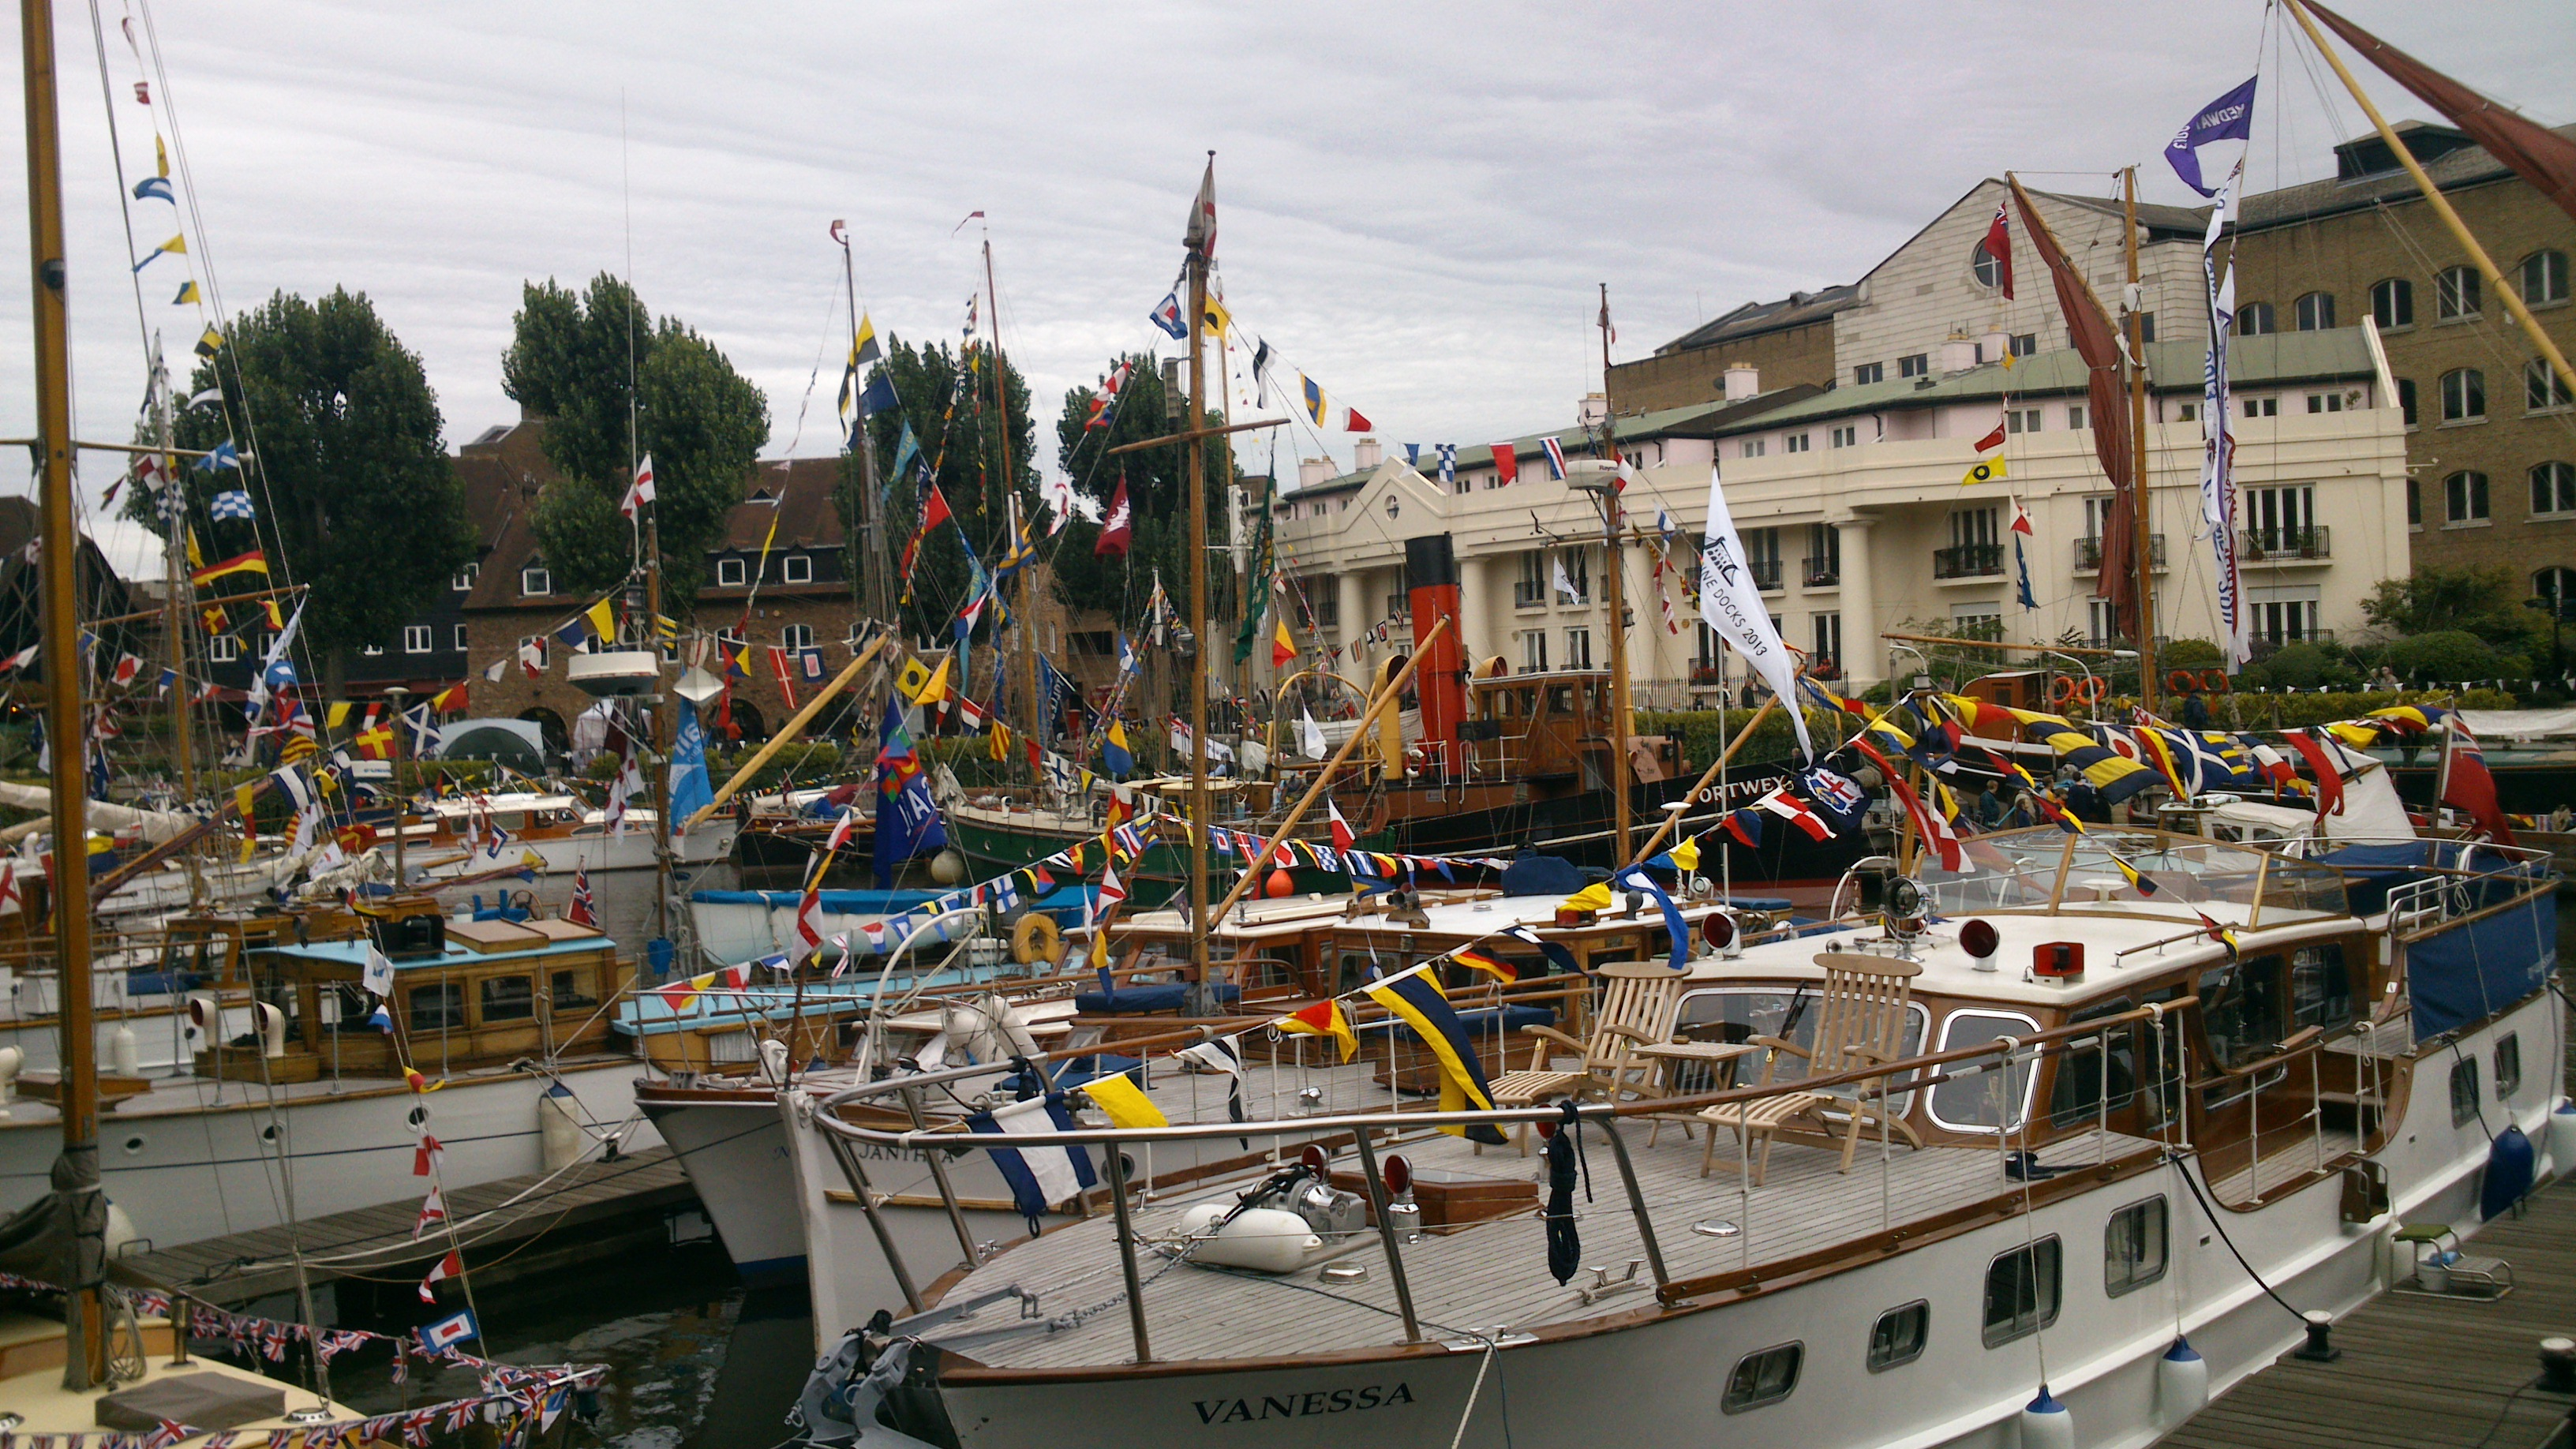 embarcadero St Katharine Docks